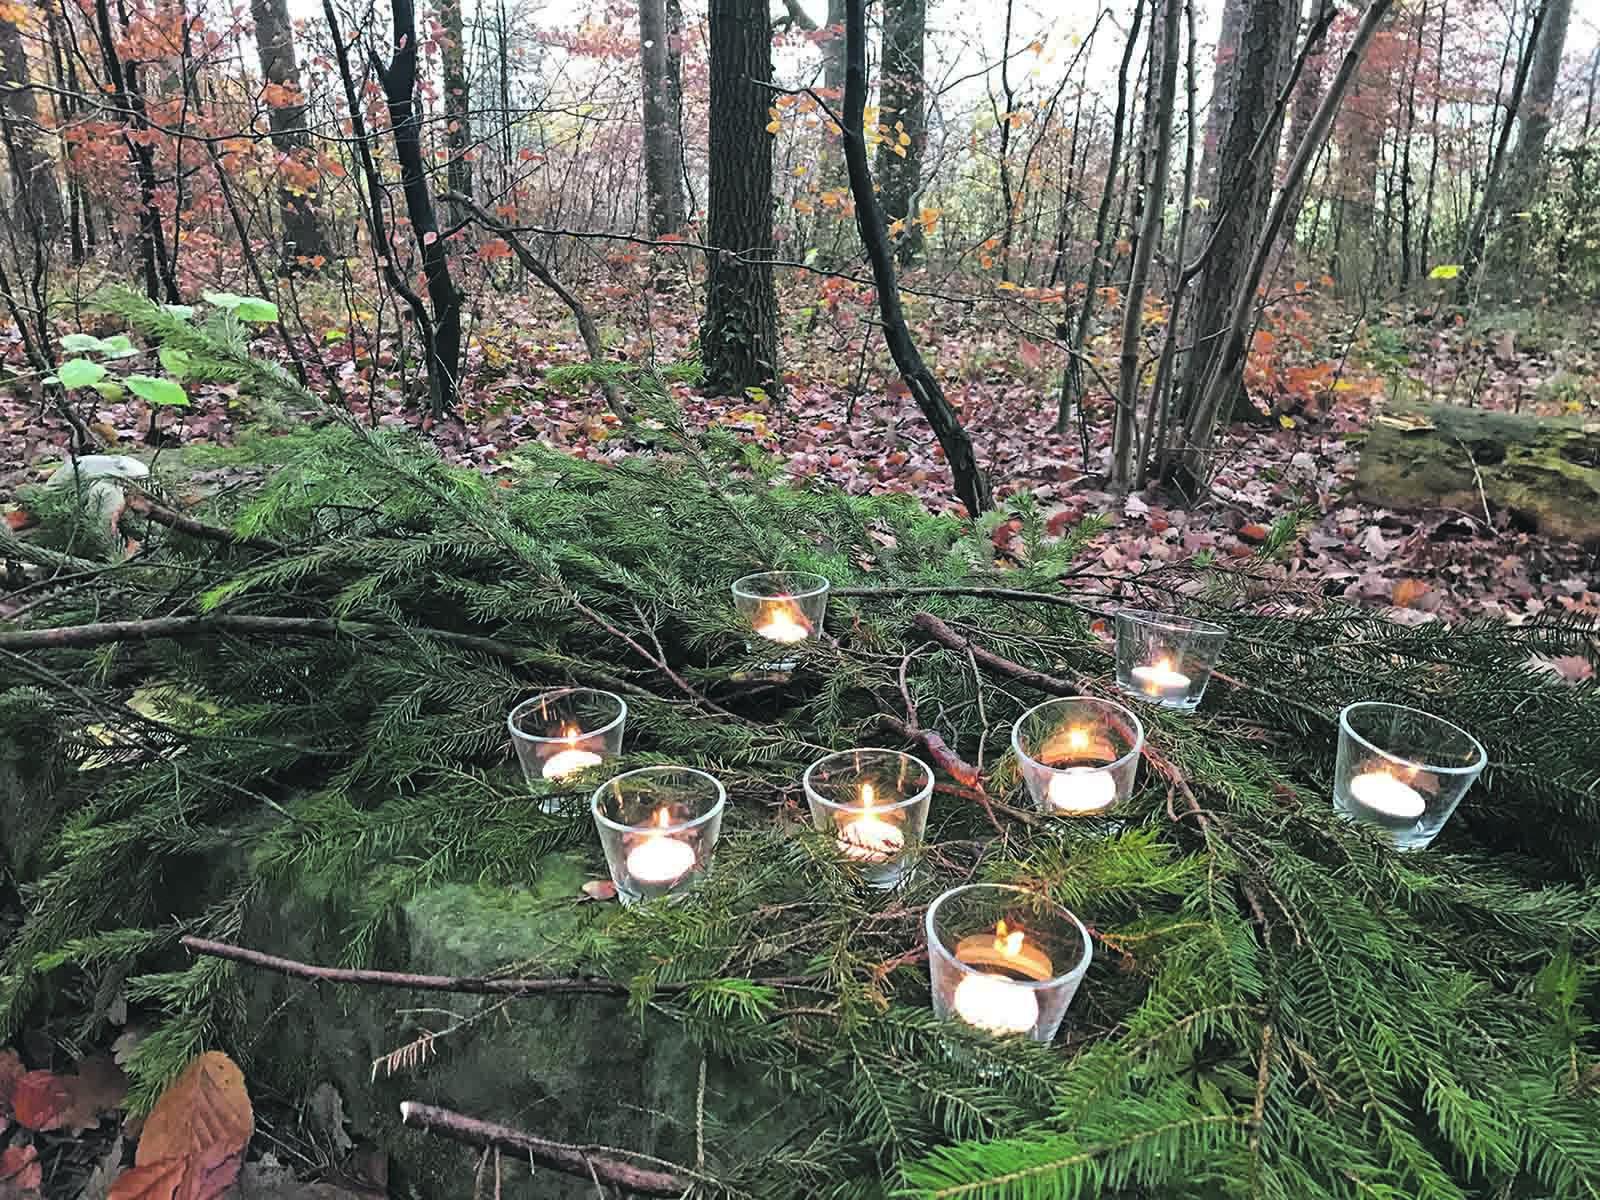 Naturspaziergang am 1. Advent